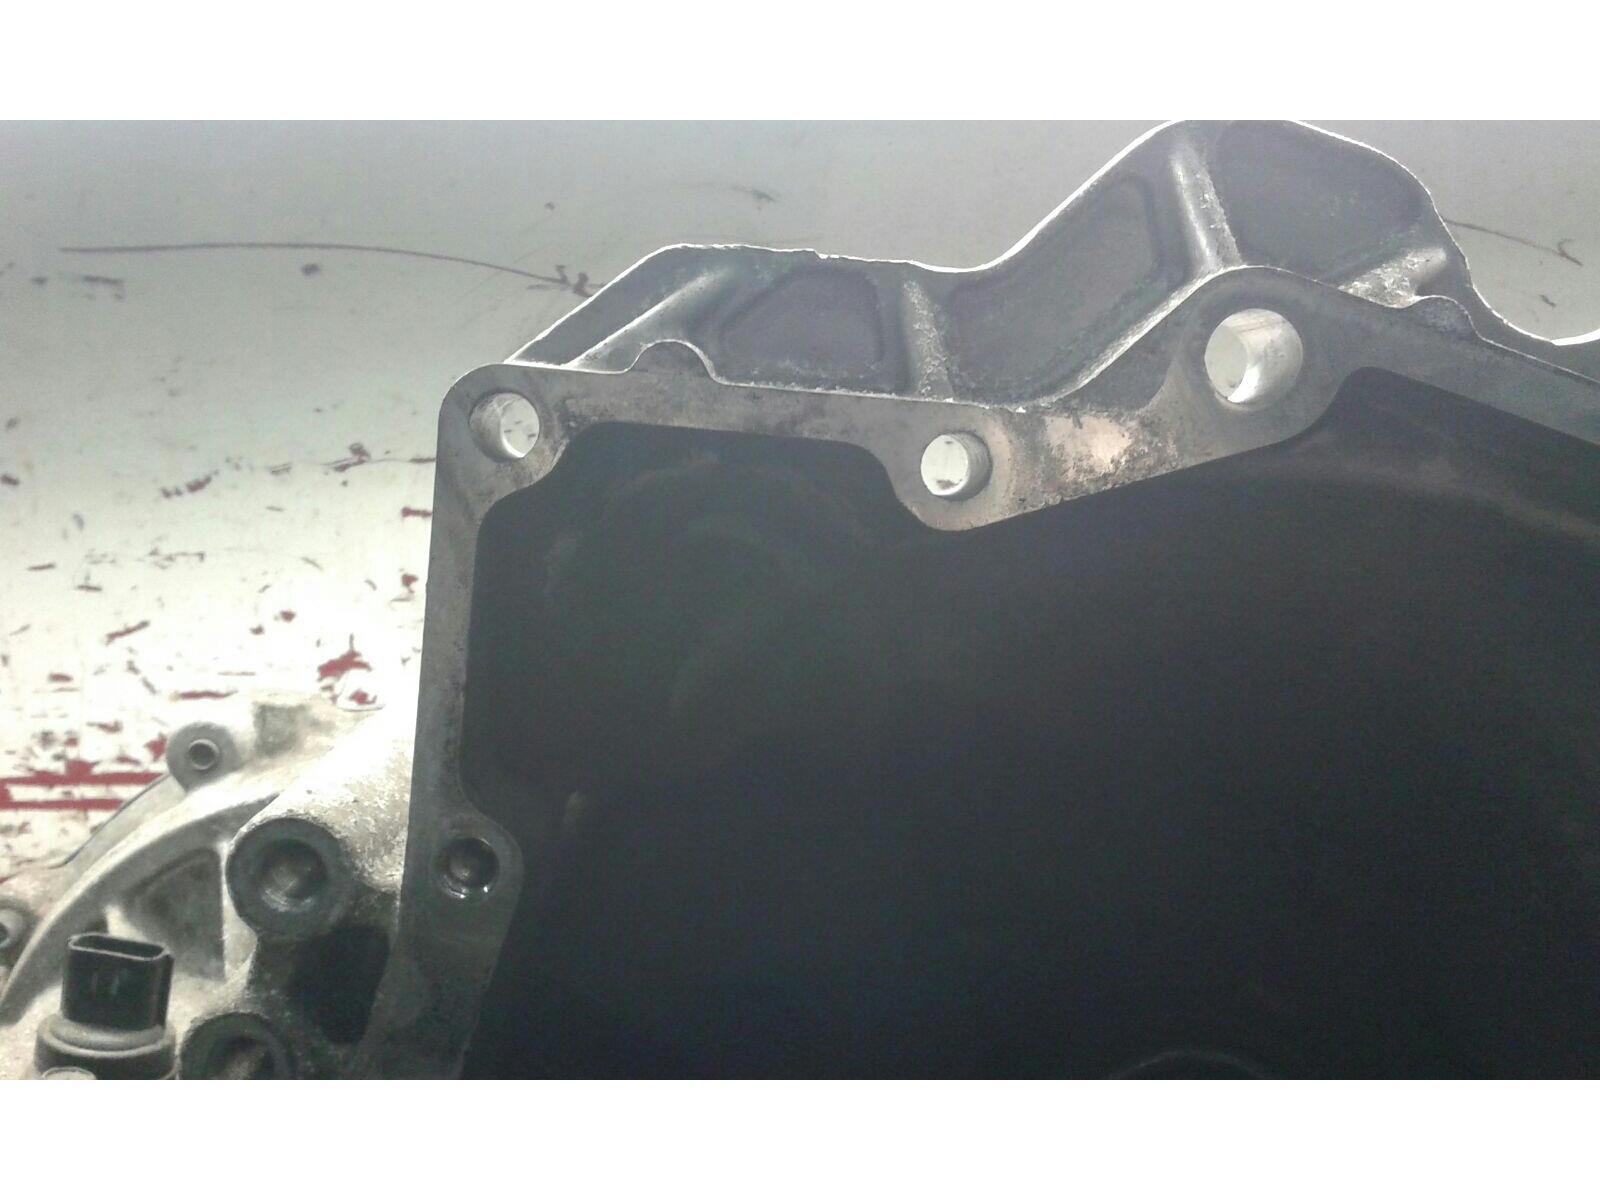 Kia Shuma Ii 2002 To 2004 Transmission Assembly Petrol Manual Fuse Box Gearbox 18 5 Speed Warranty 1348926